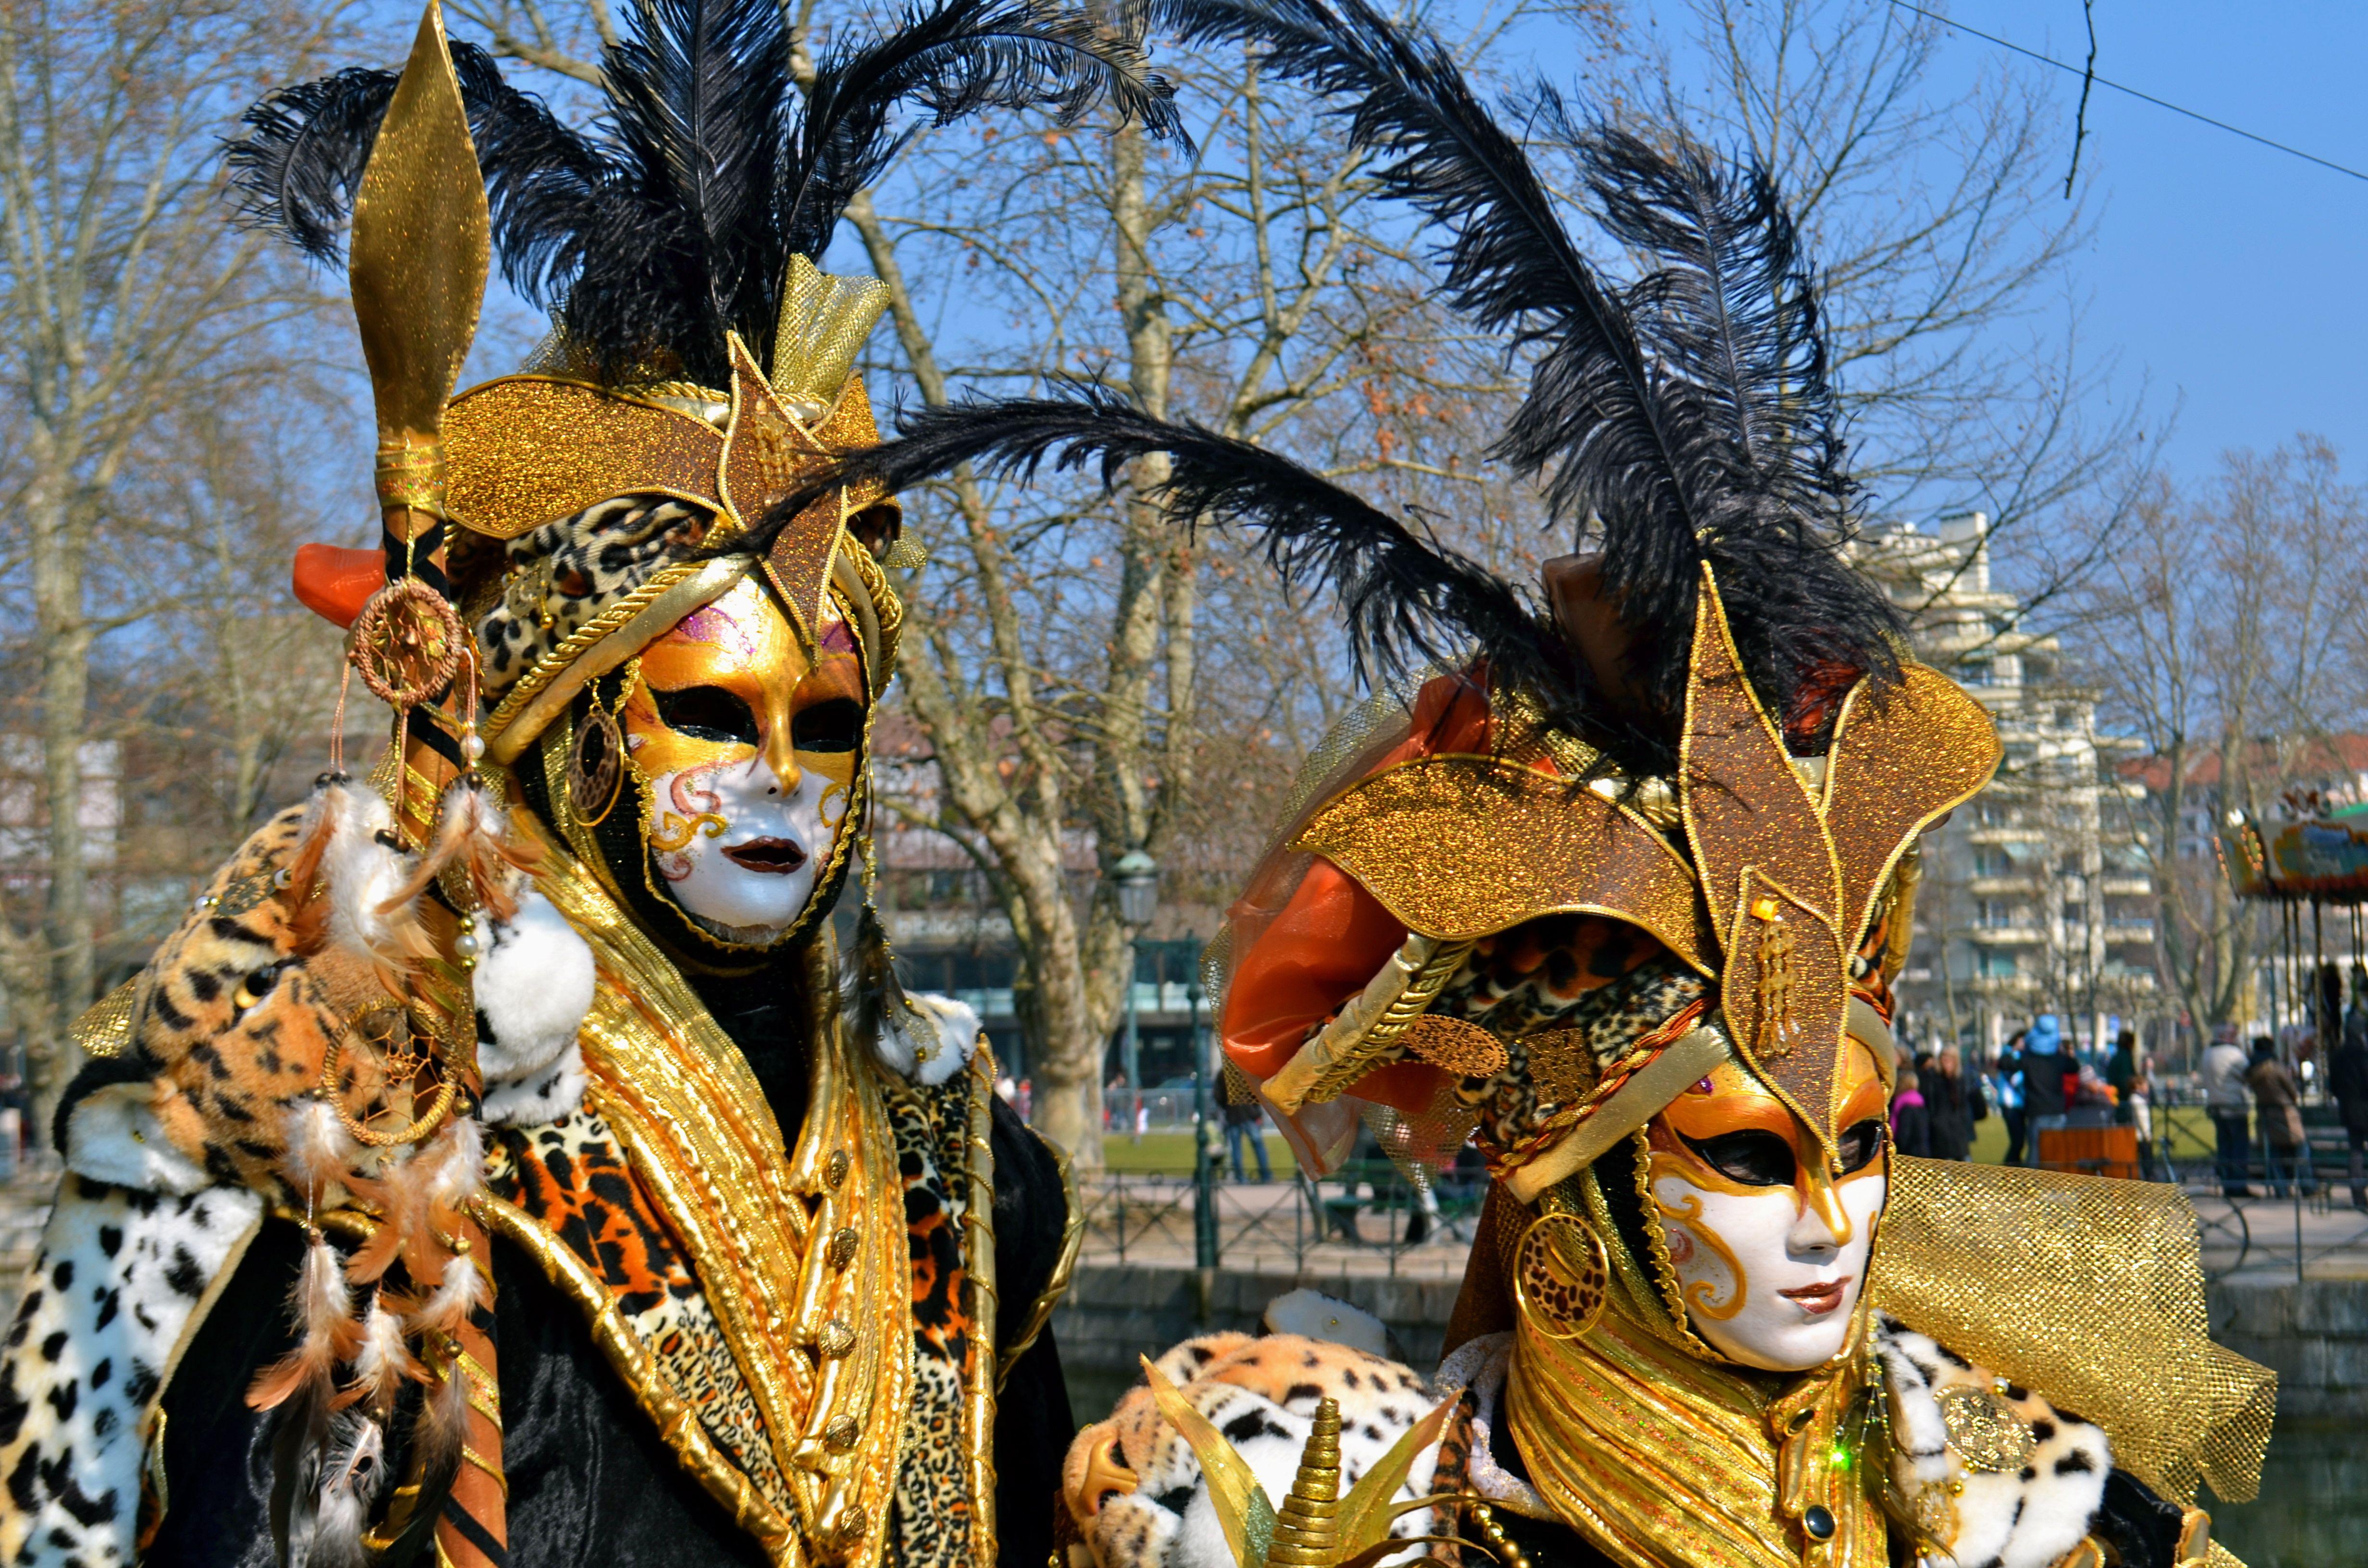 Annecy's Venetian Carnival | Carnival, Venetian and Masking